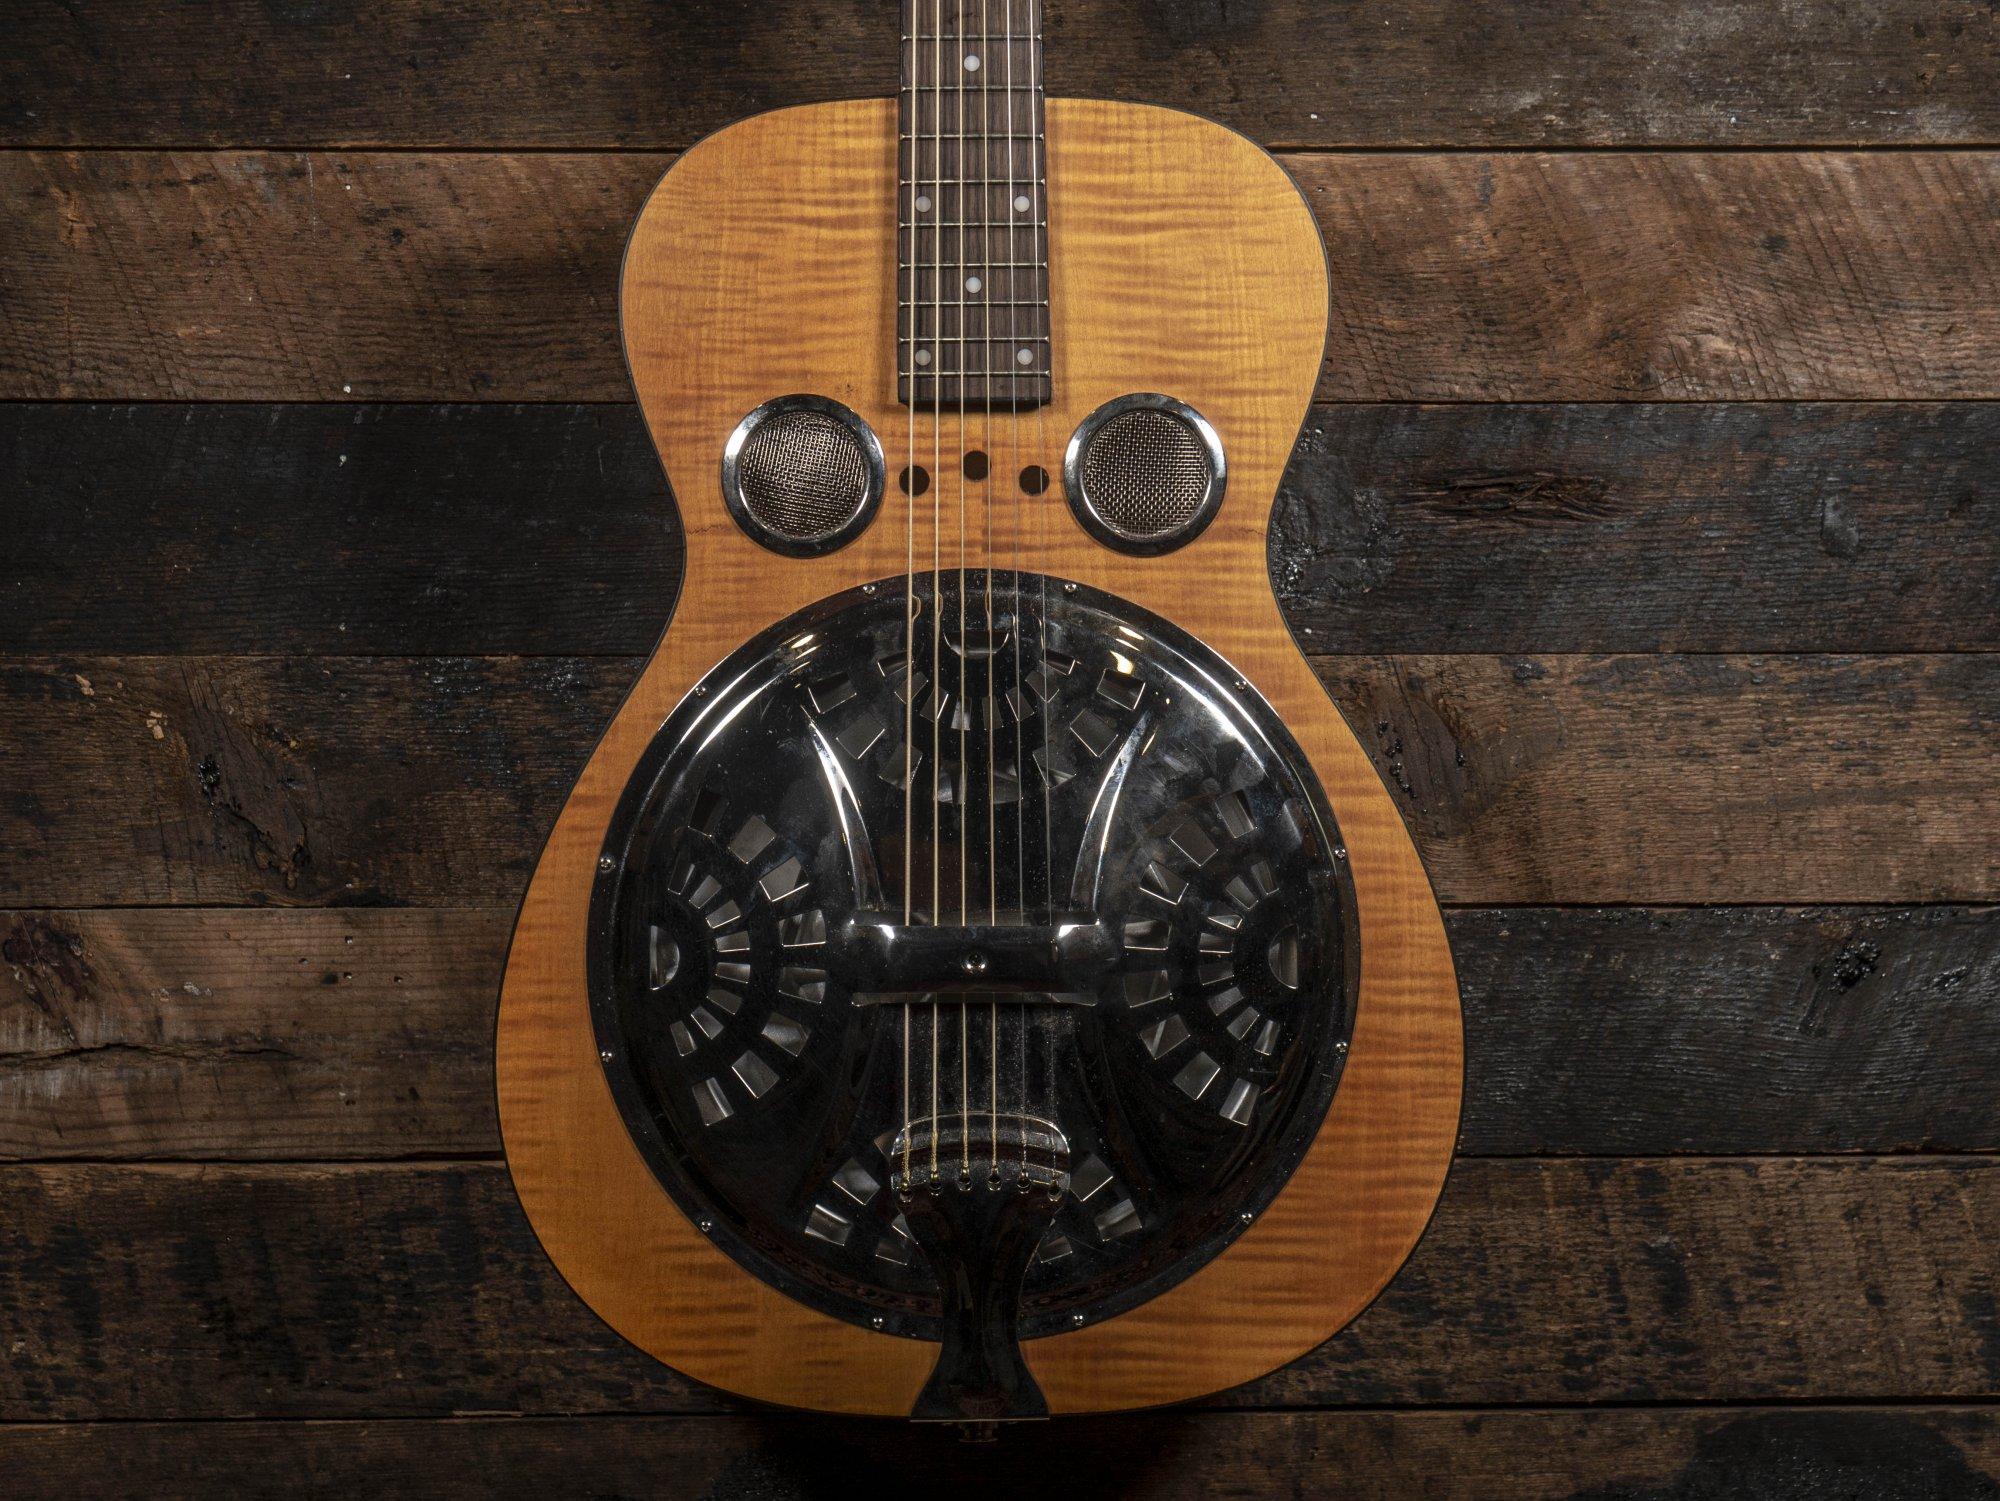 Dobro Hound Dog Deluxe Round Neck Resonator Guitar Natural